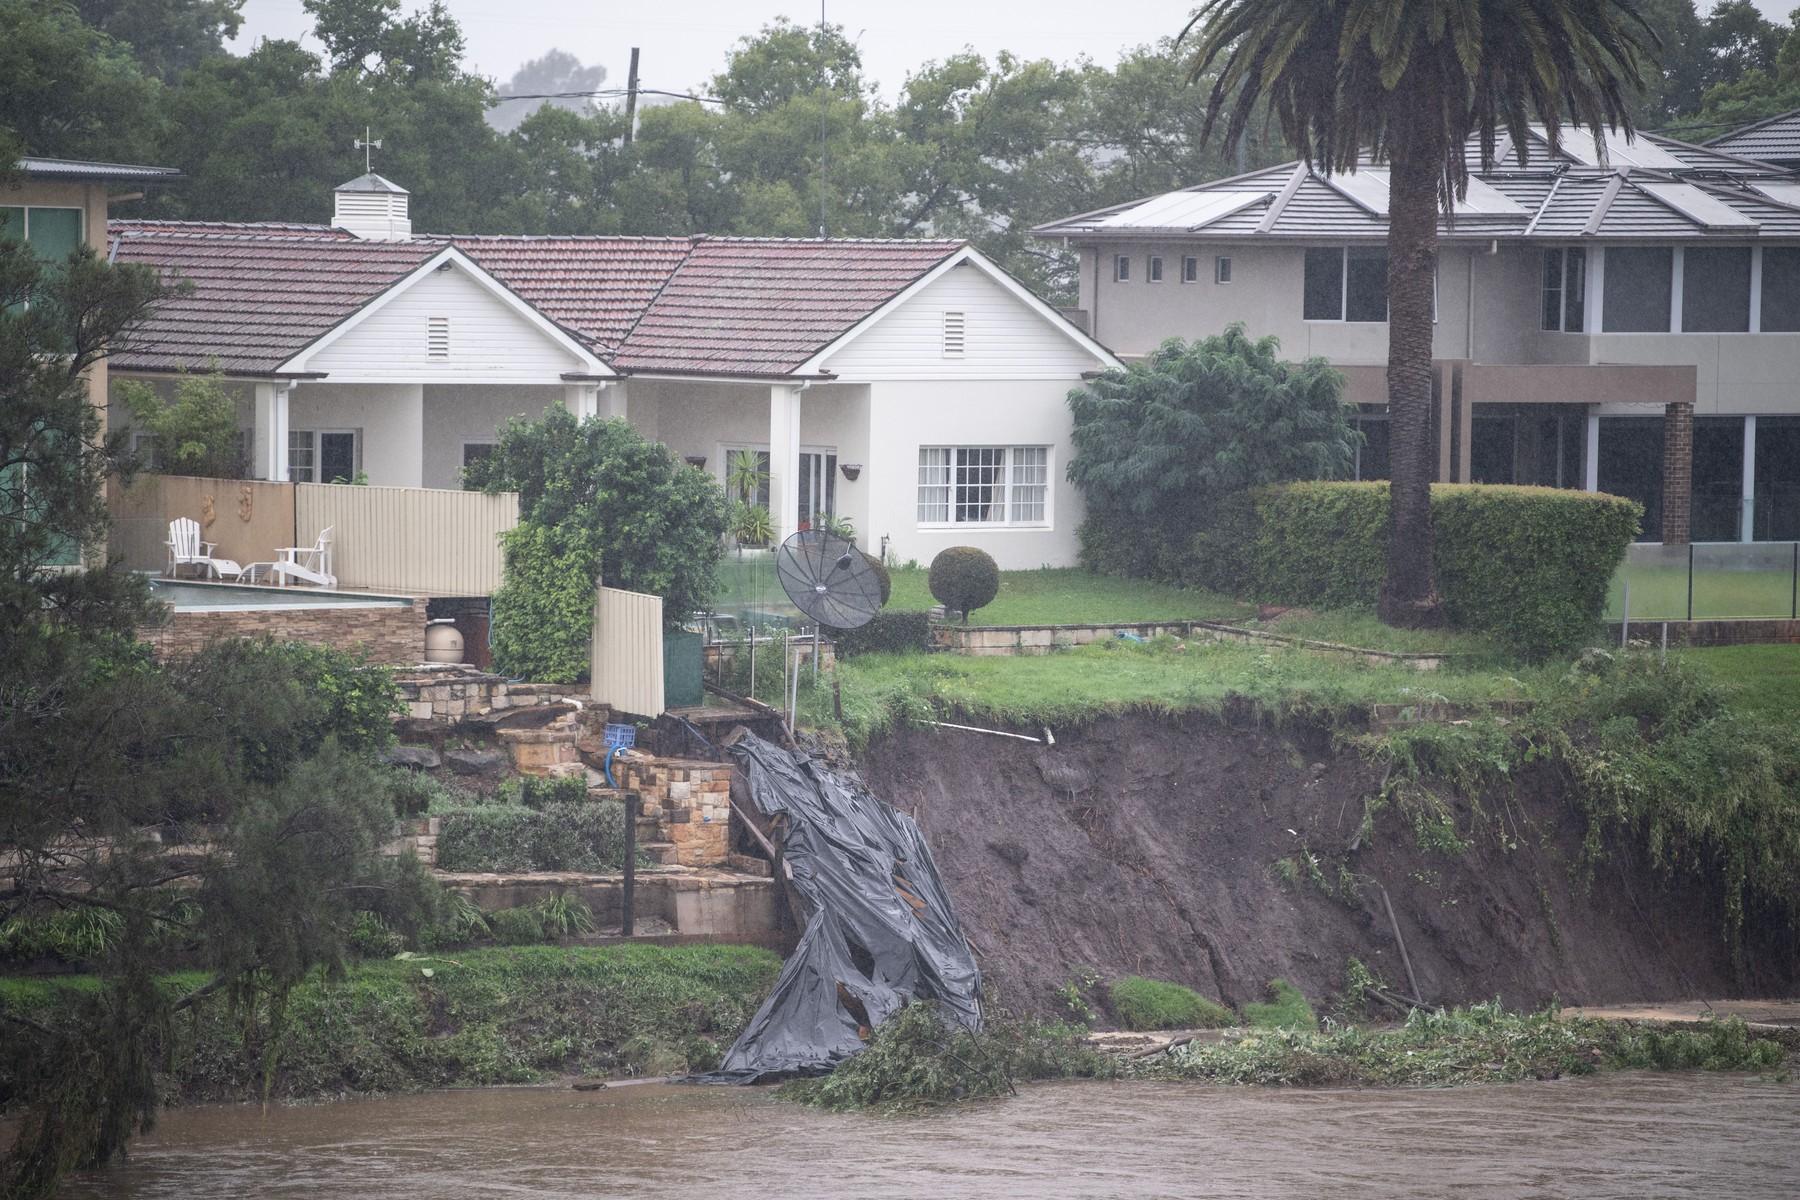 Floods in Sydney, Australia - 23 Mar 2021